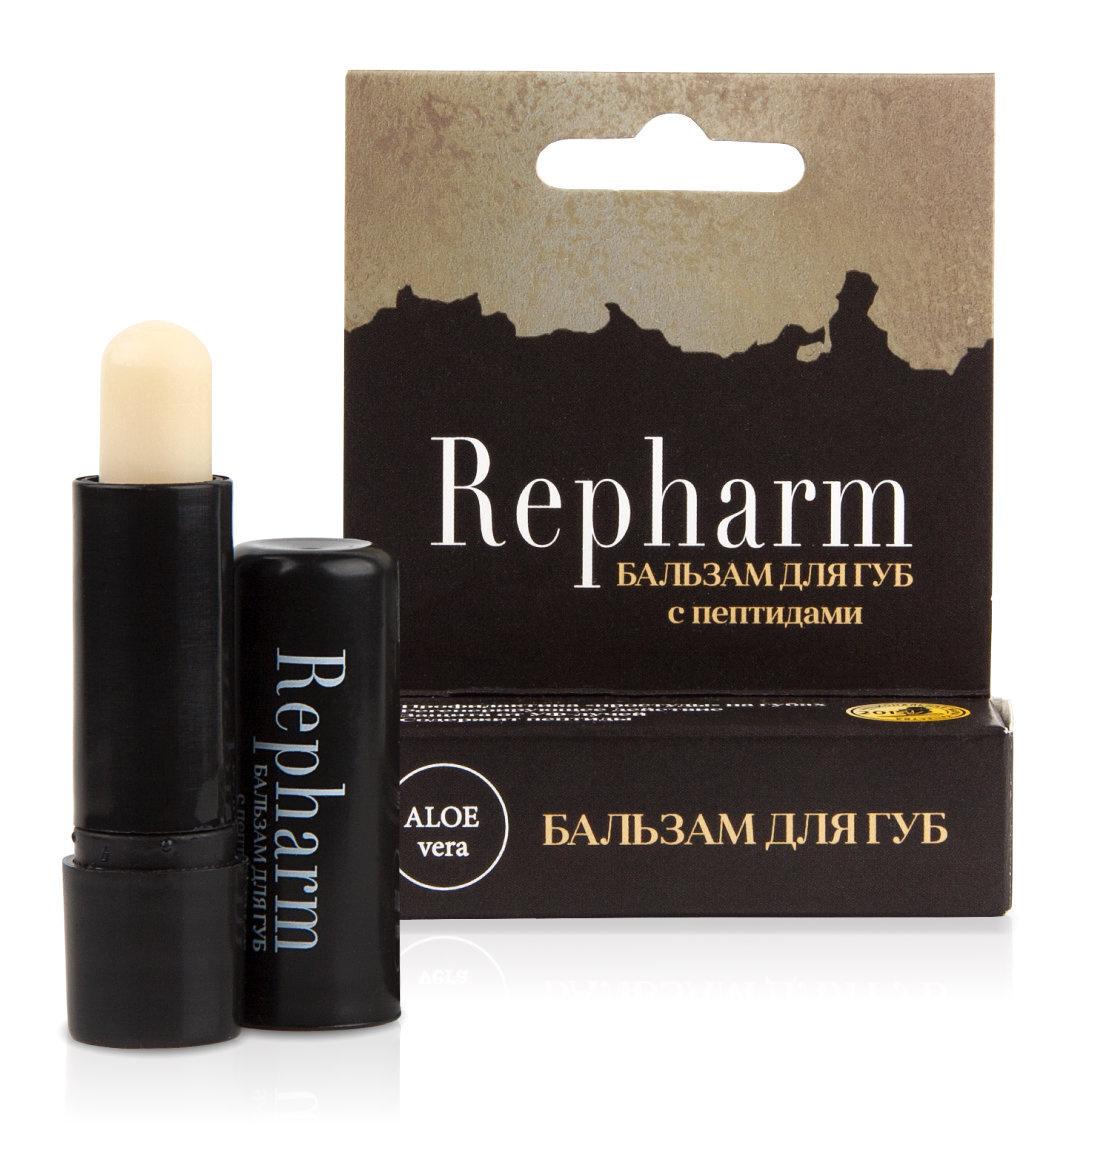 Бальзам для губ Repharm с пептидами 5 мл #1